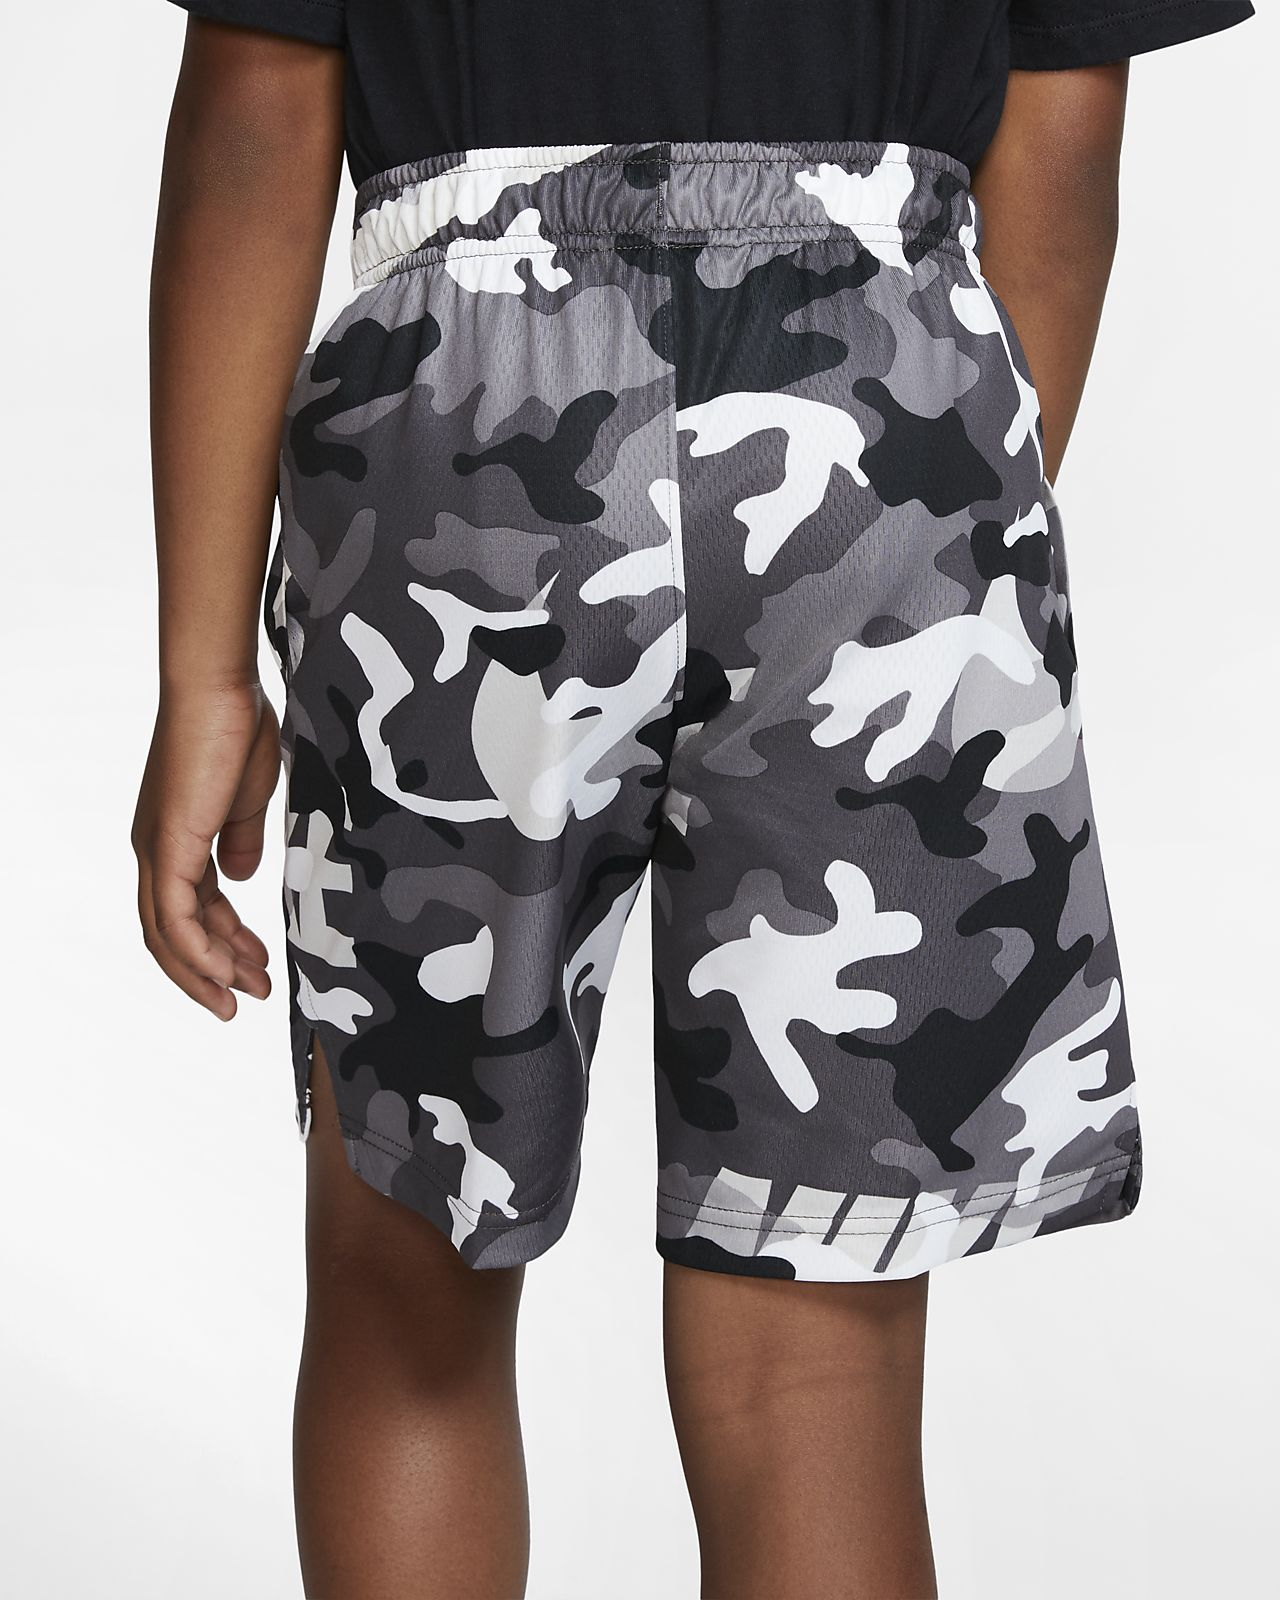 37edd6b47cf7d Nike Dri-FIT Boys' Camo Training Shorts. Nike.com